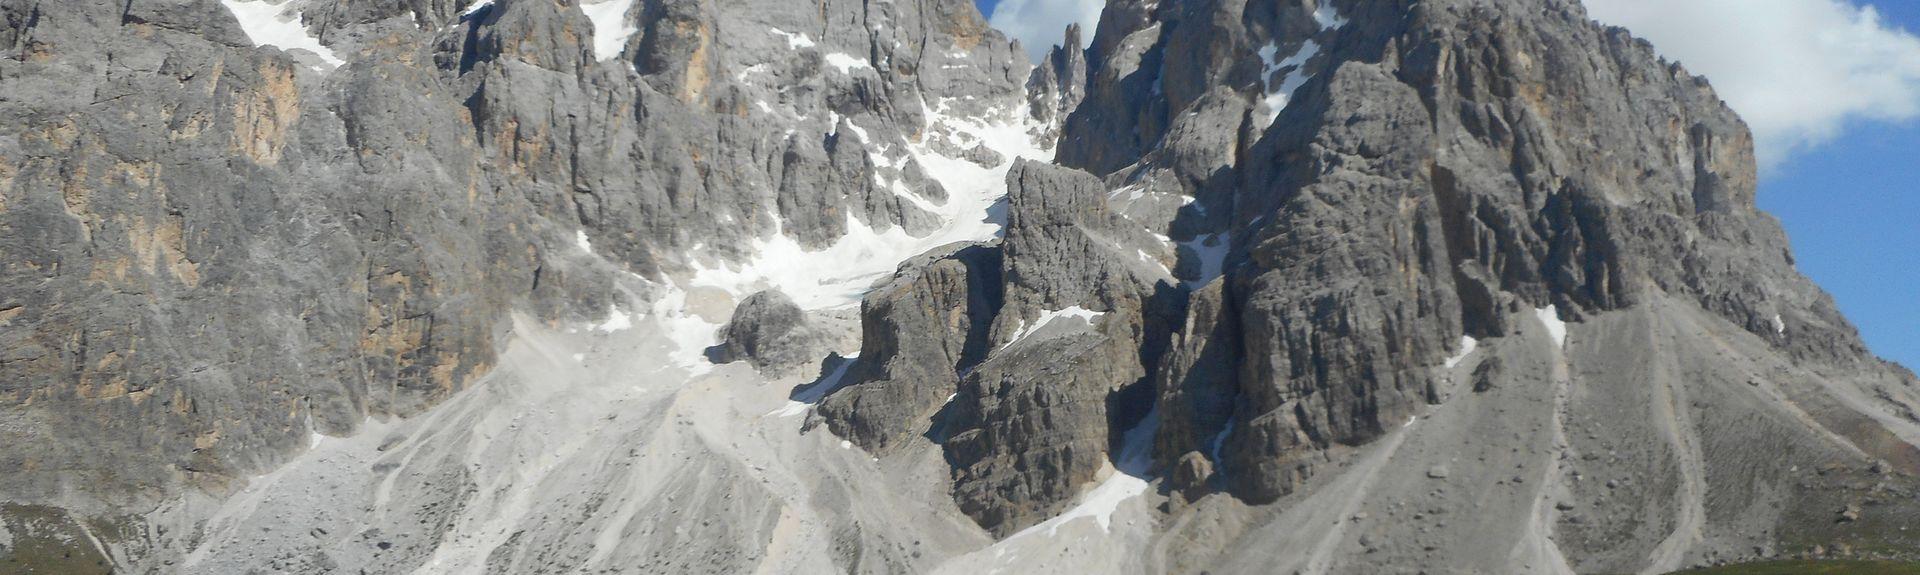 Passo Rolle, Trento, Trentino-Alto Adige/South Tyrol, Italy